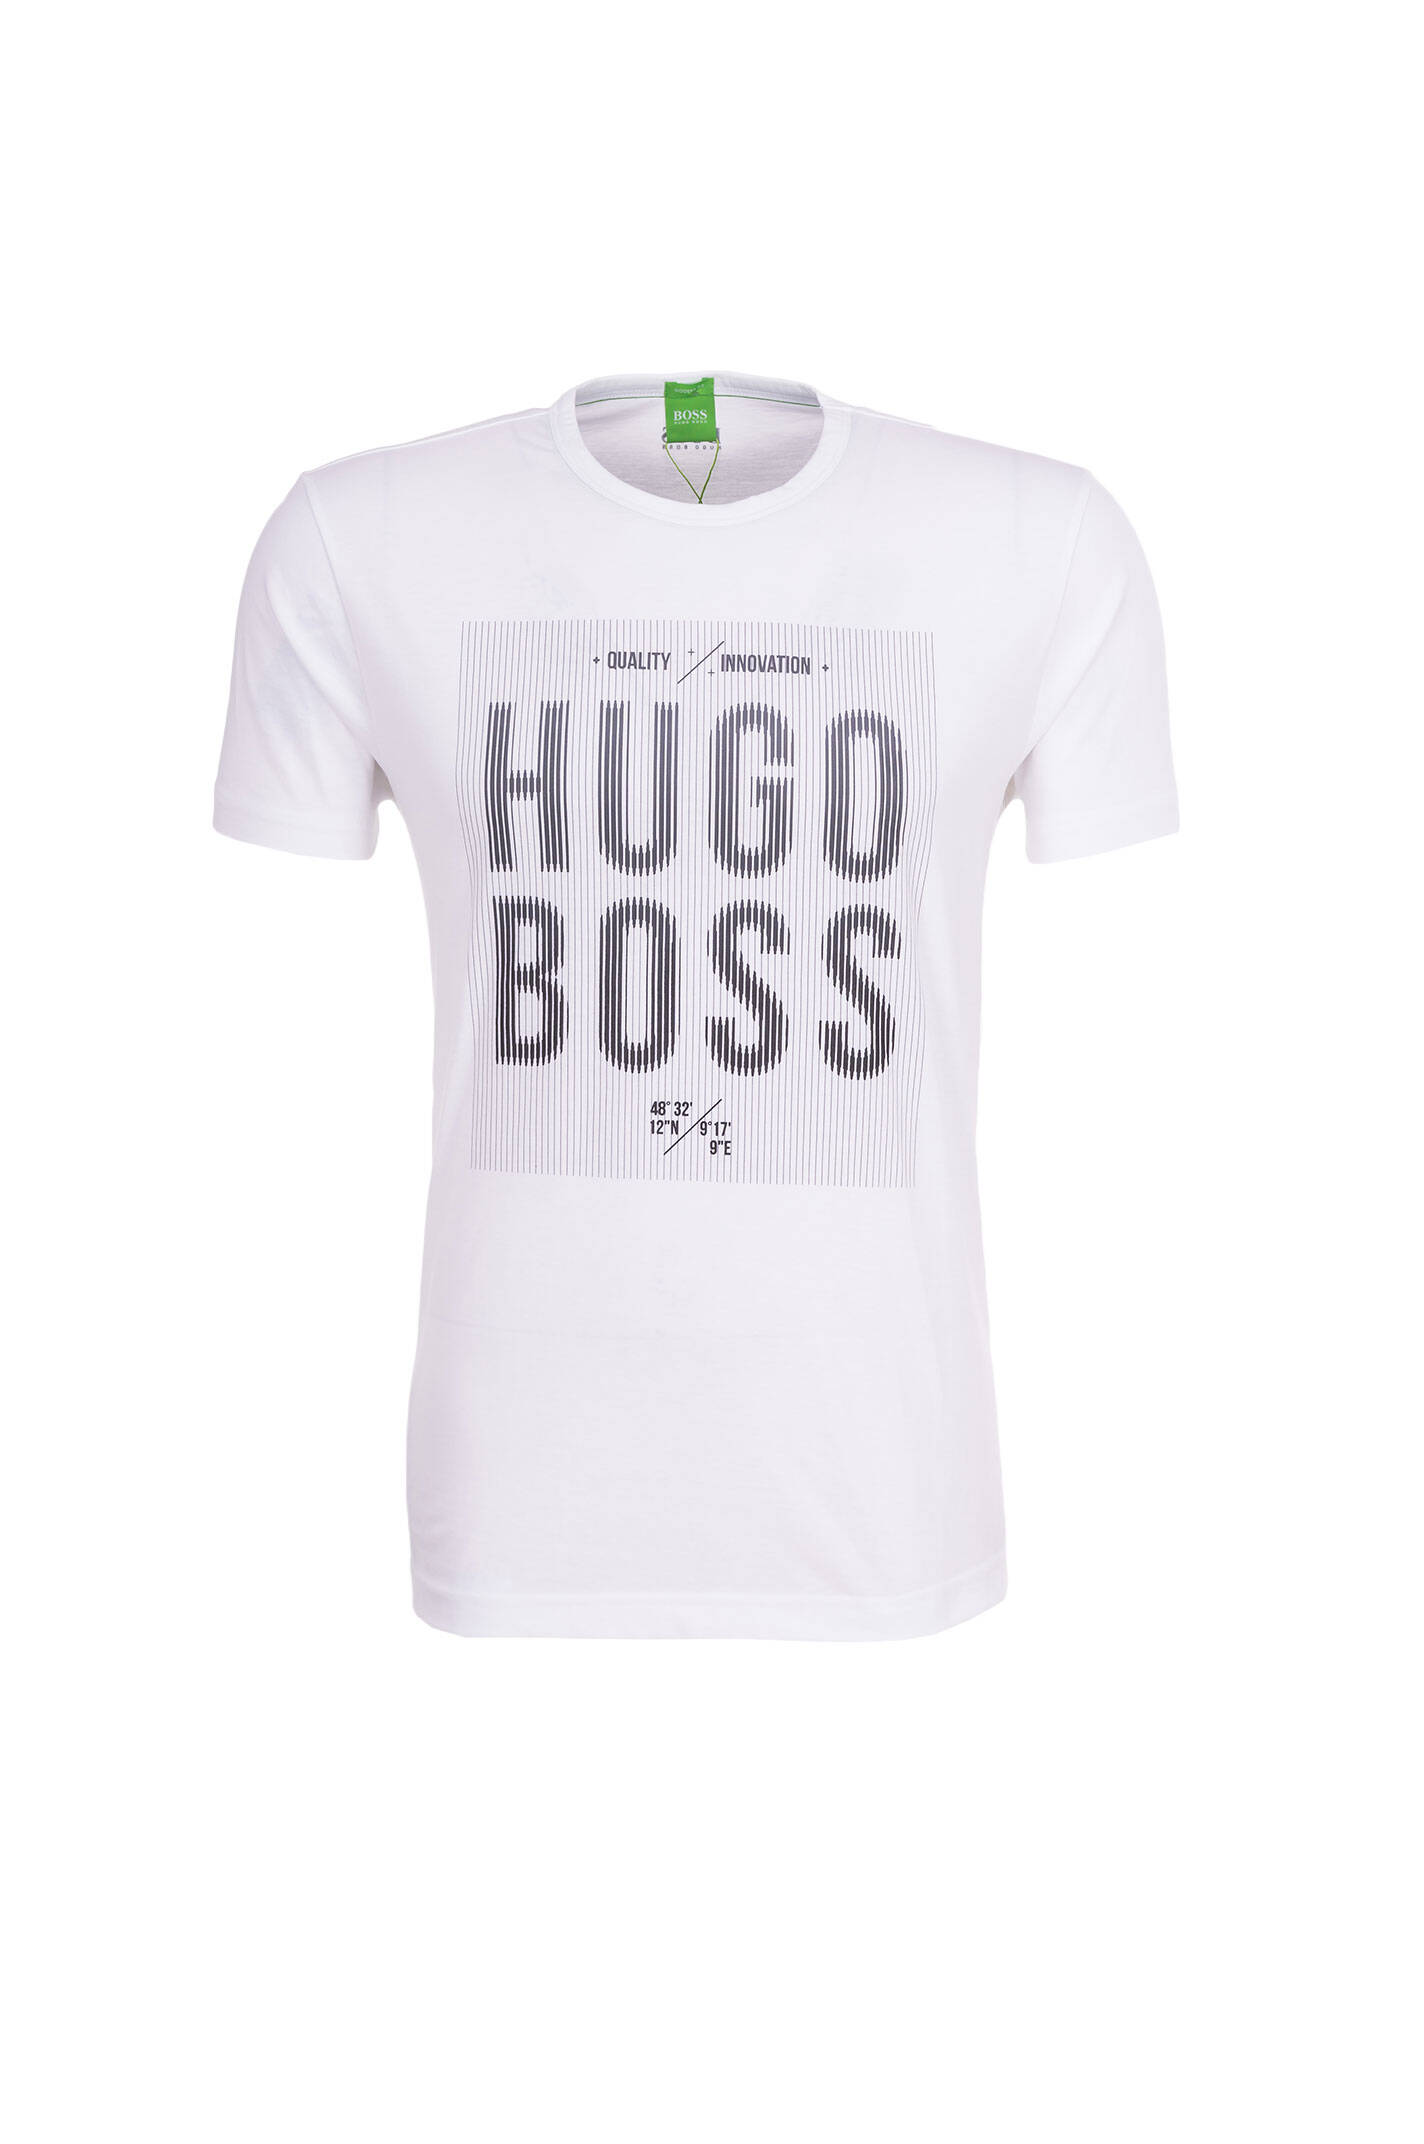 5273363661 Tee 2 T-shirt Boss Athleisure | White | Gomez.pl/en